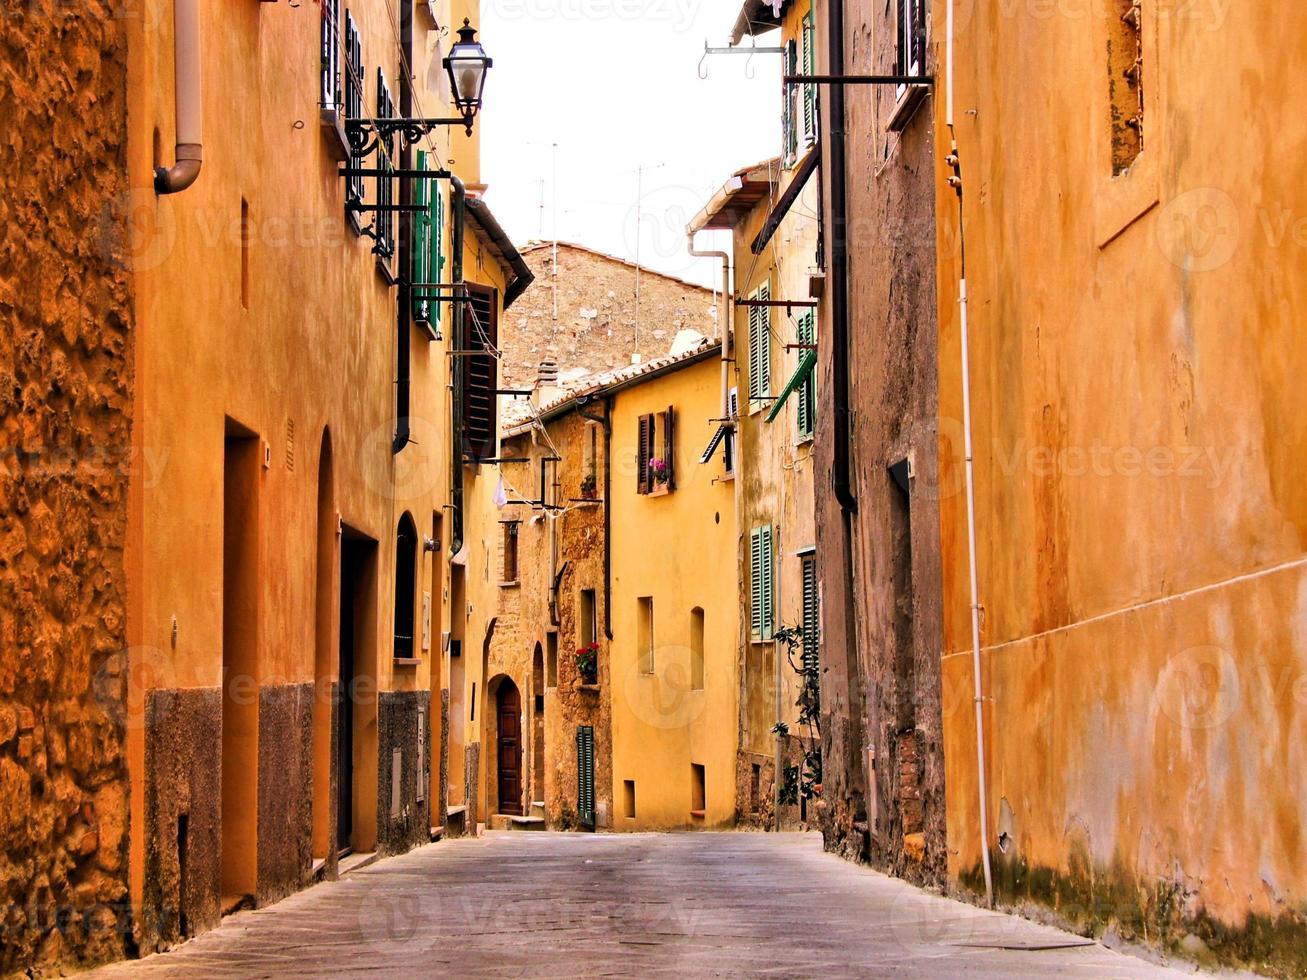 medeltida italiensk gata foto